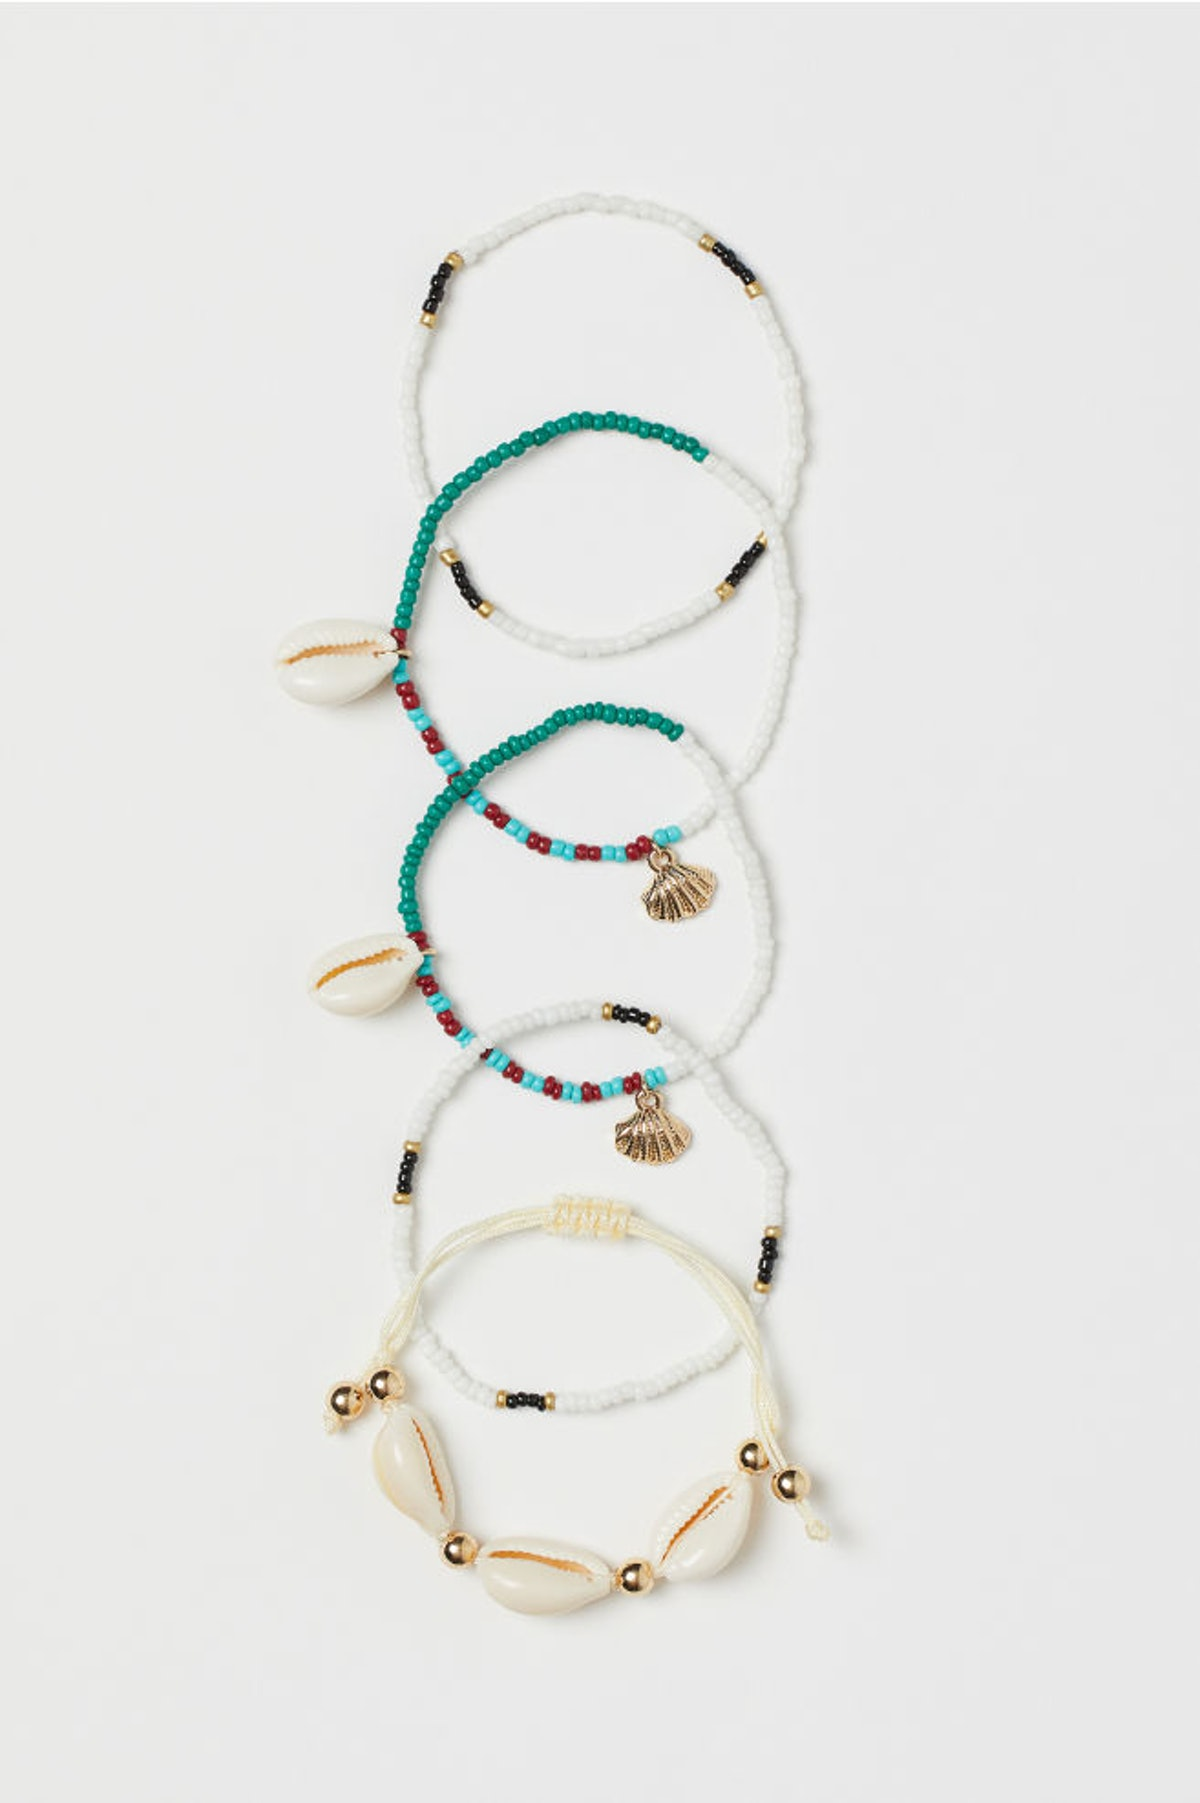 5-pack Bracelets